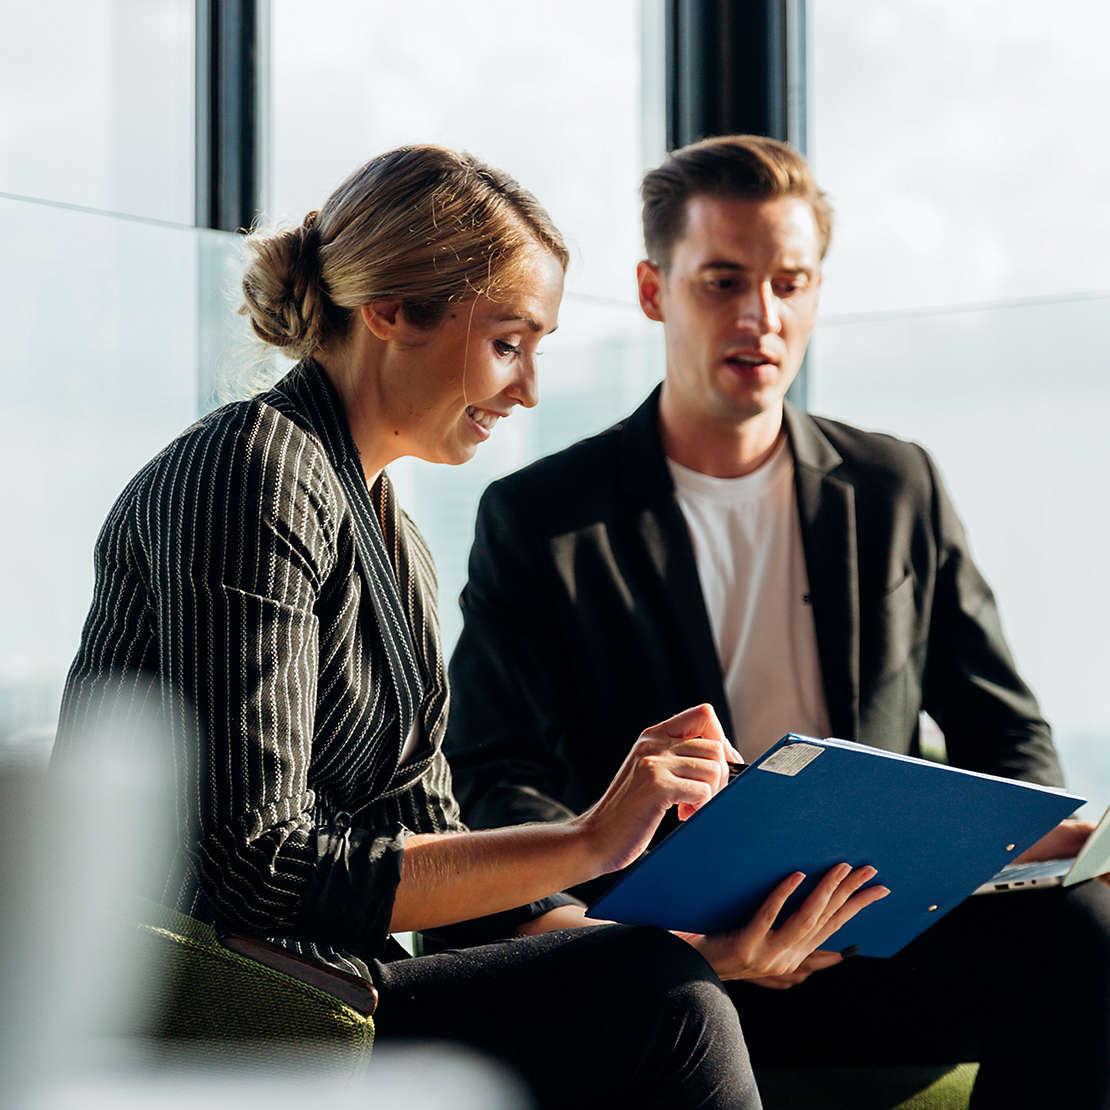 Woman and man looking at clipboard